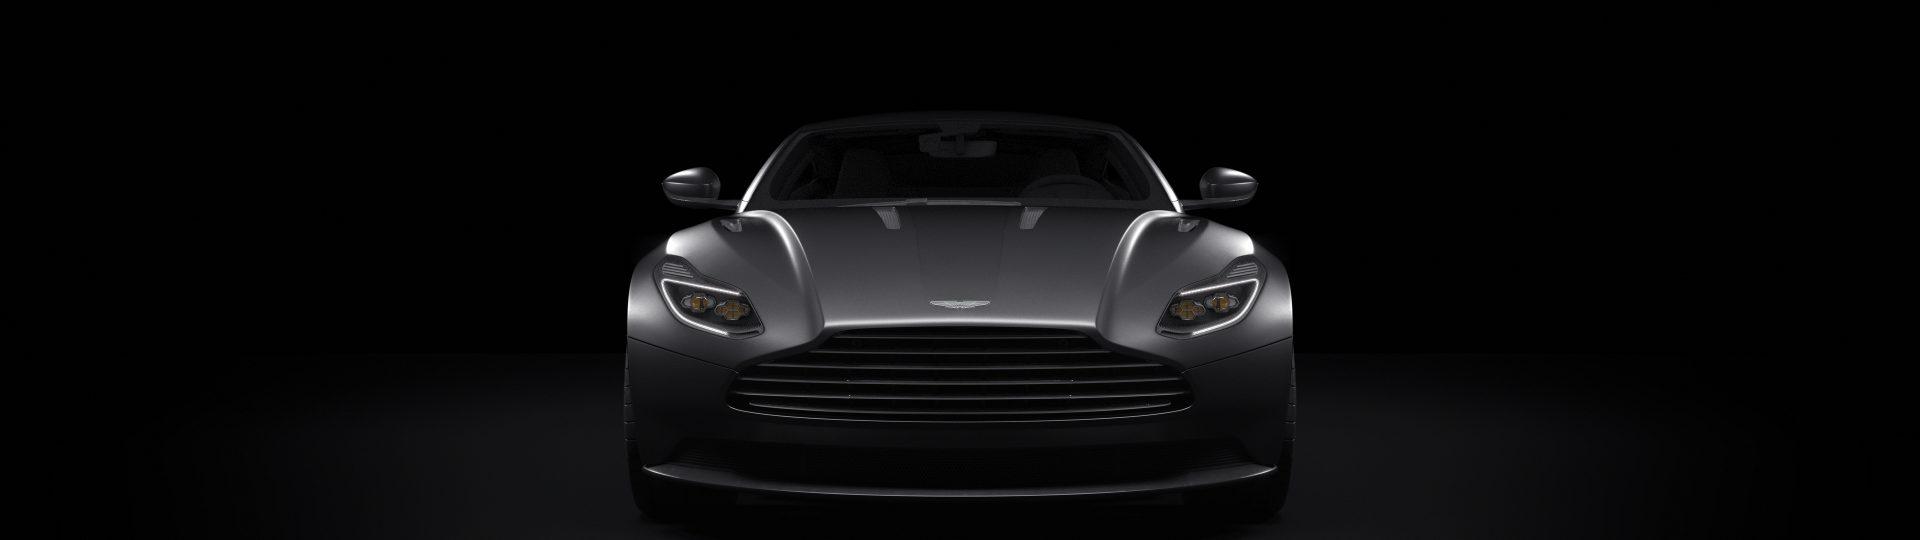 Aston Martin DB11 2017 - Front